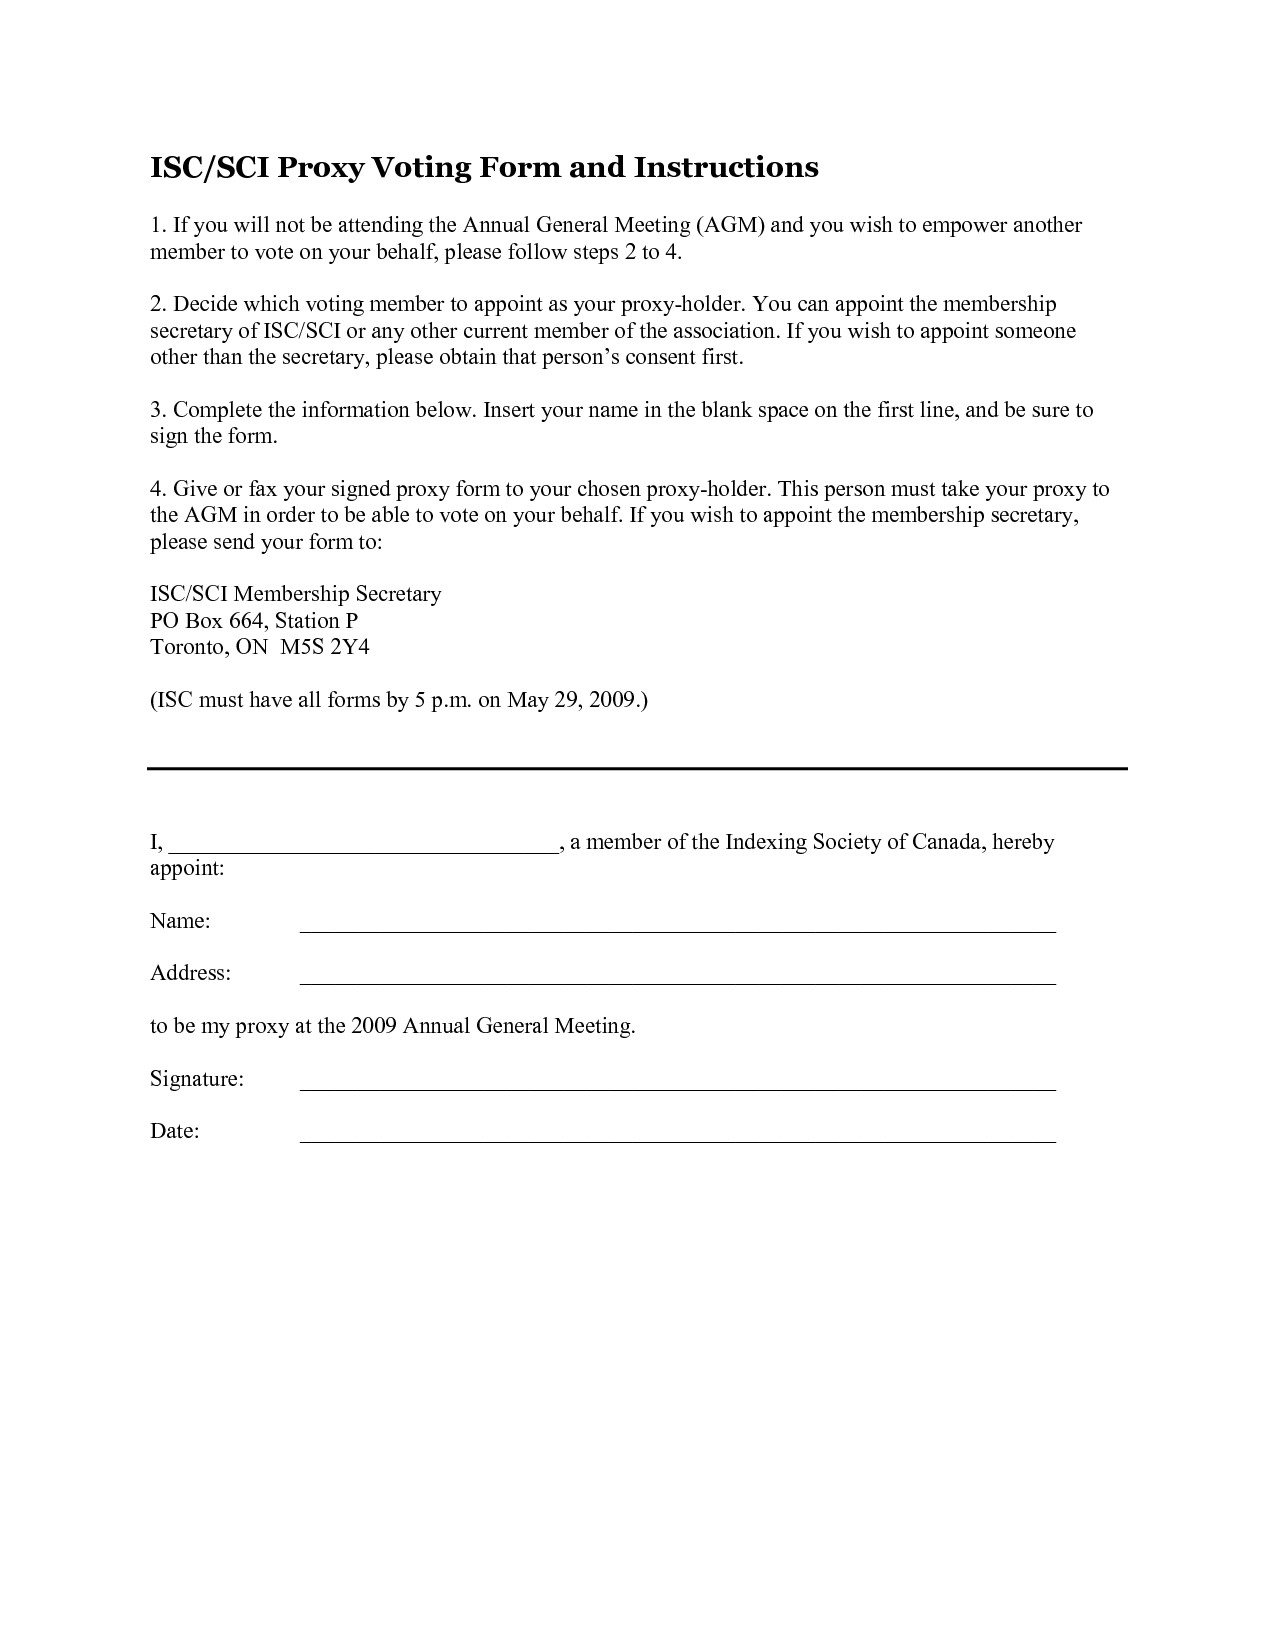 Hoa Proxy Vote form Template Dodoisthere — Proxy Vote form Template Hoa Proxy form